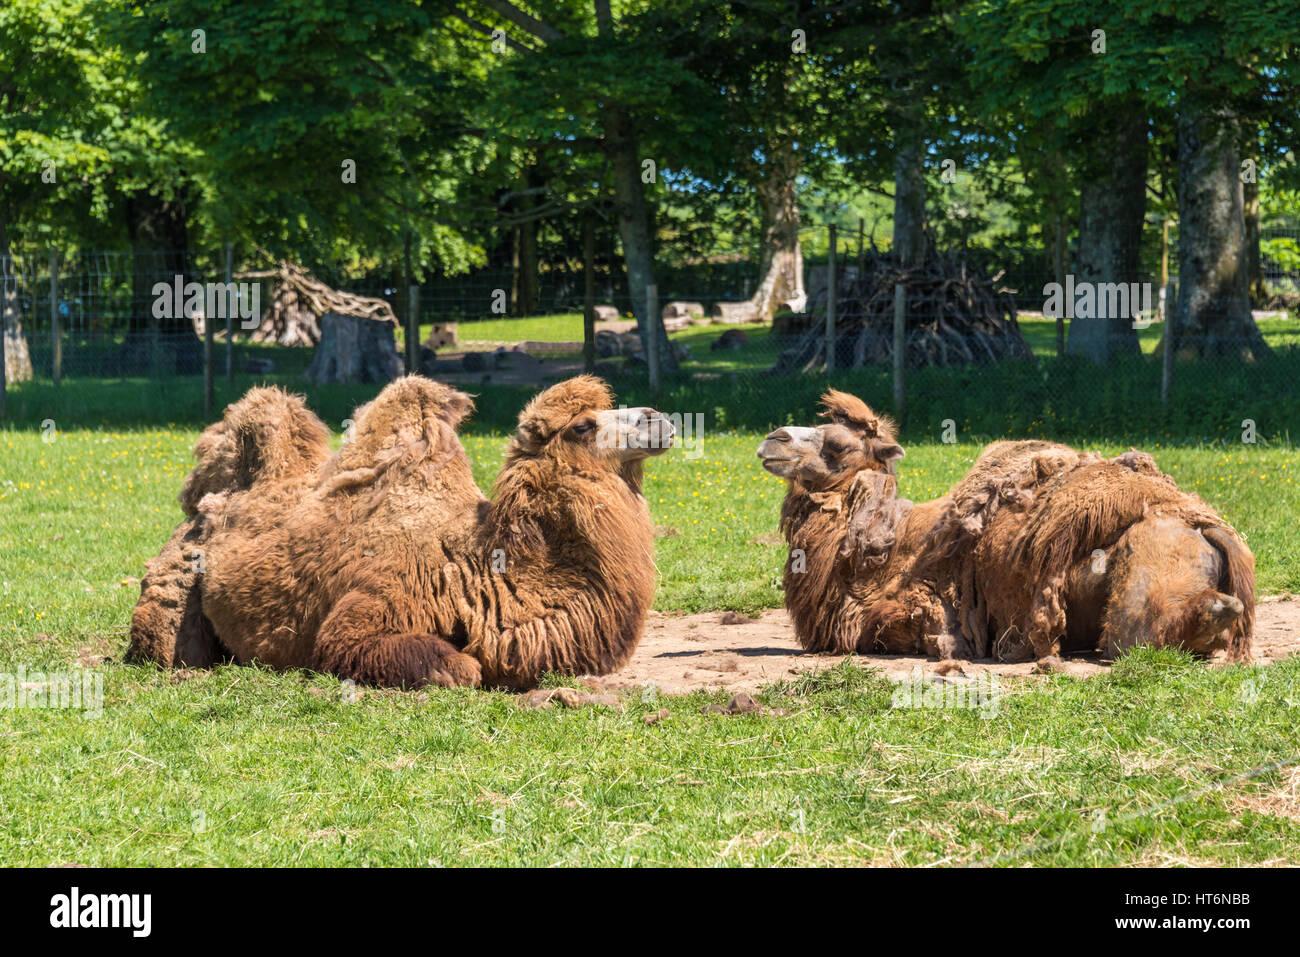 2 Humped Camel Stock Photos Images